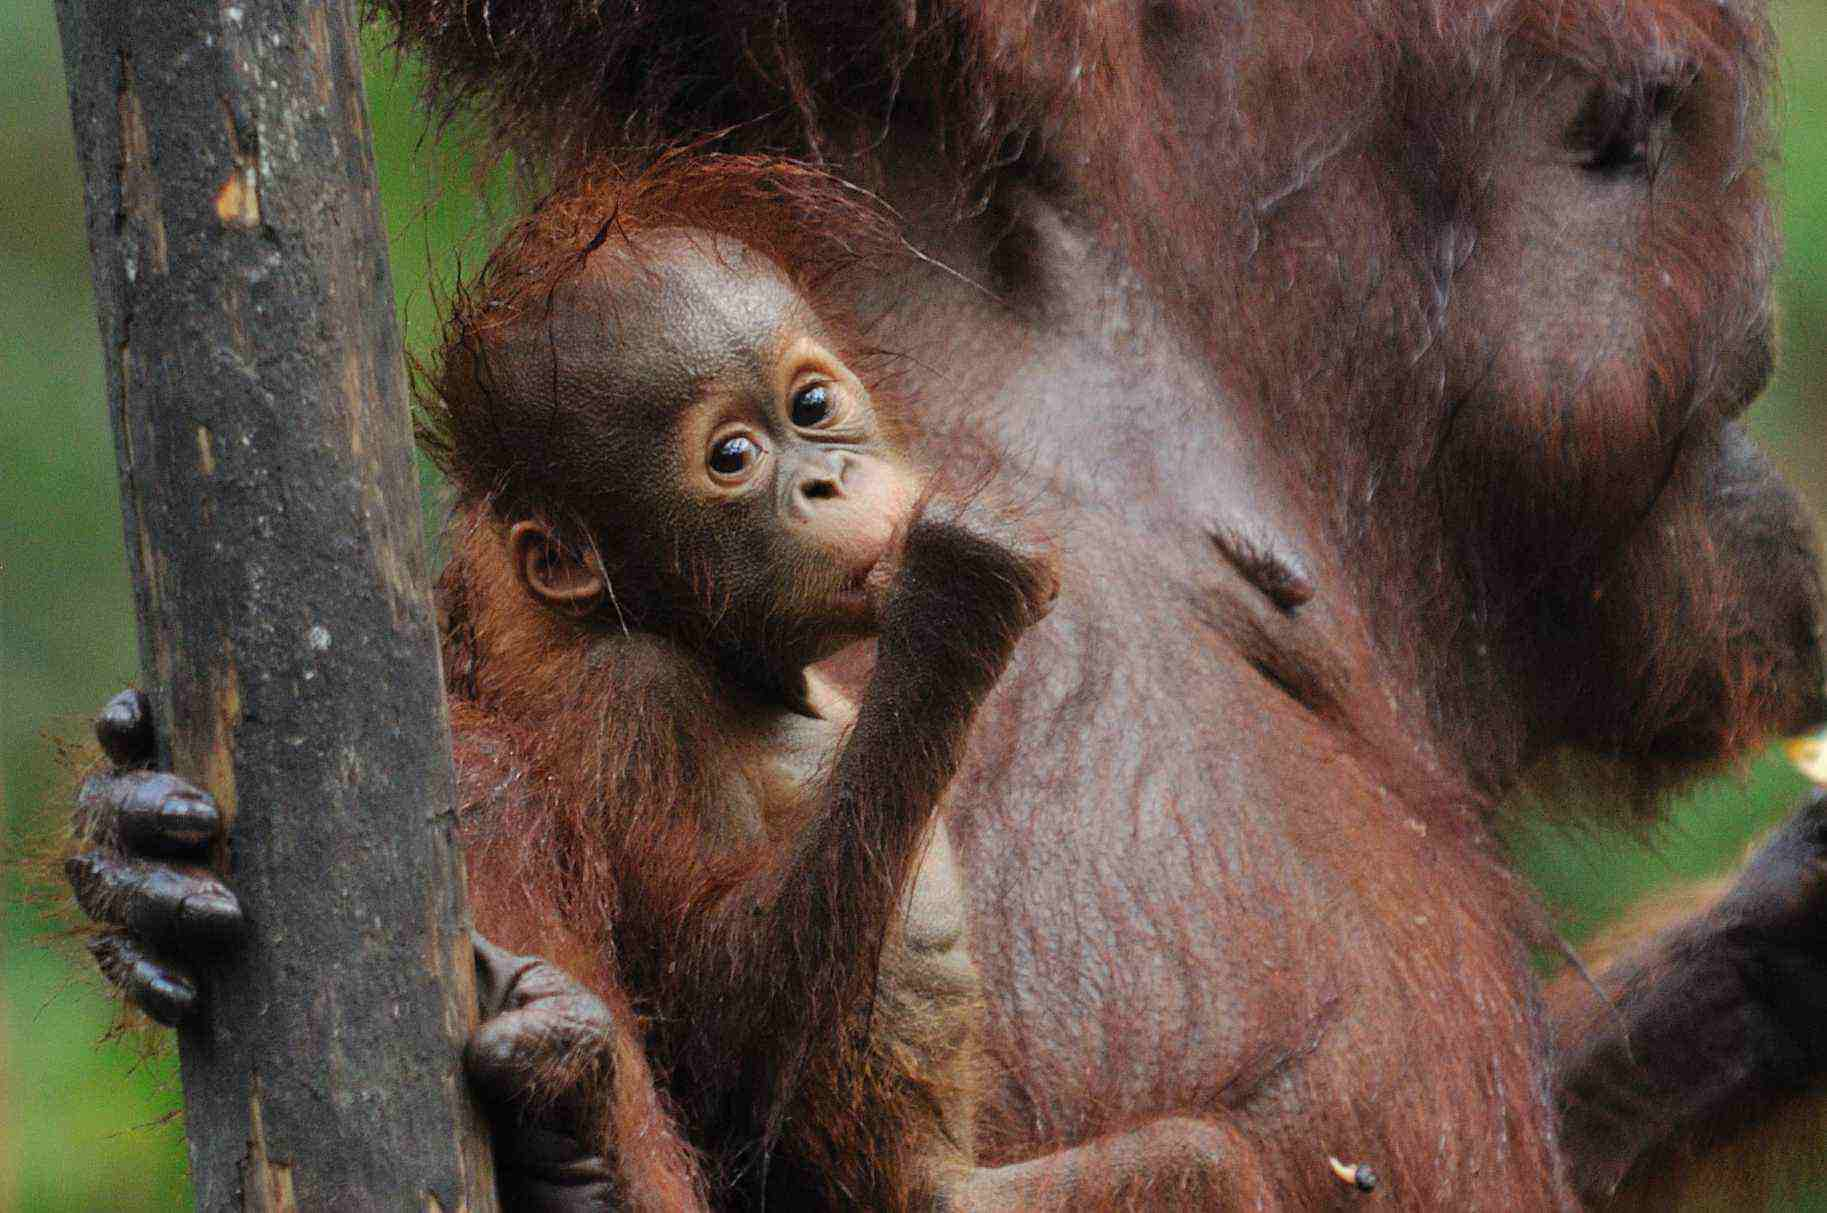 balikpapan, samboja, bukit bankirai, orangutan, wildlife safari, tour, trip guide, proboscis monkeys jungle